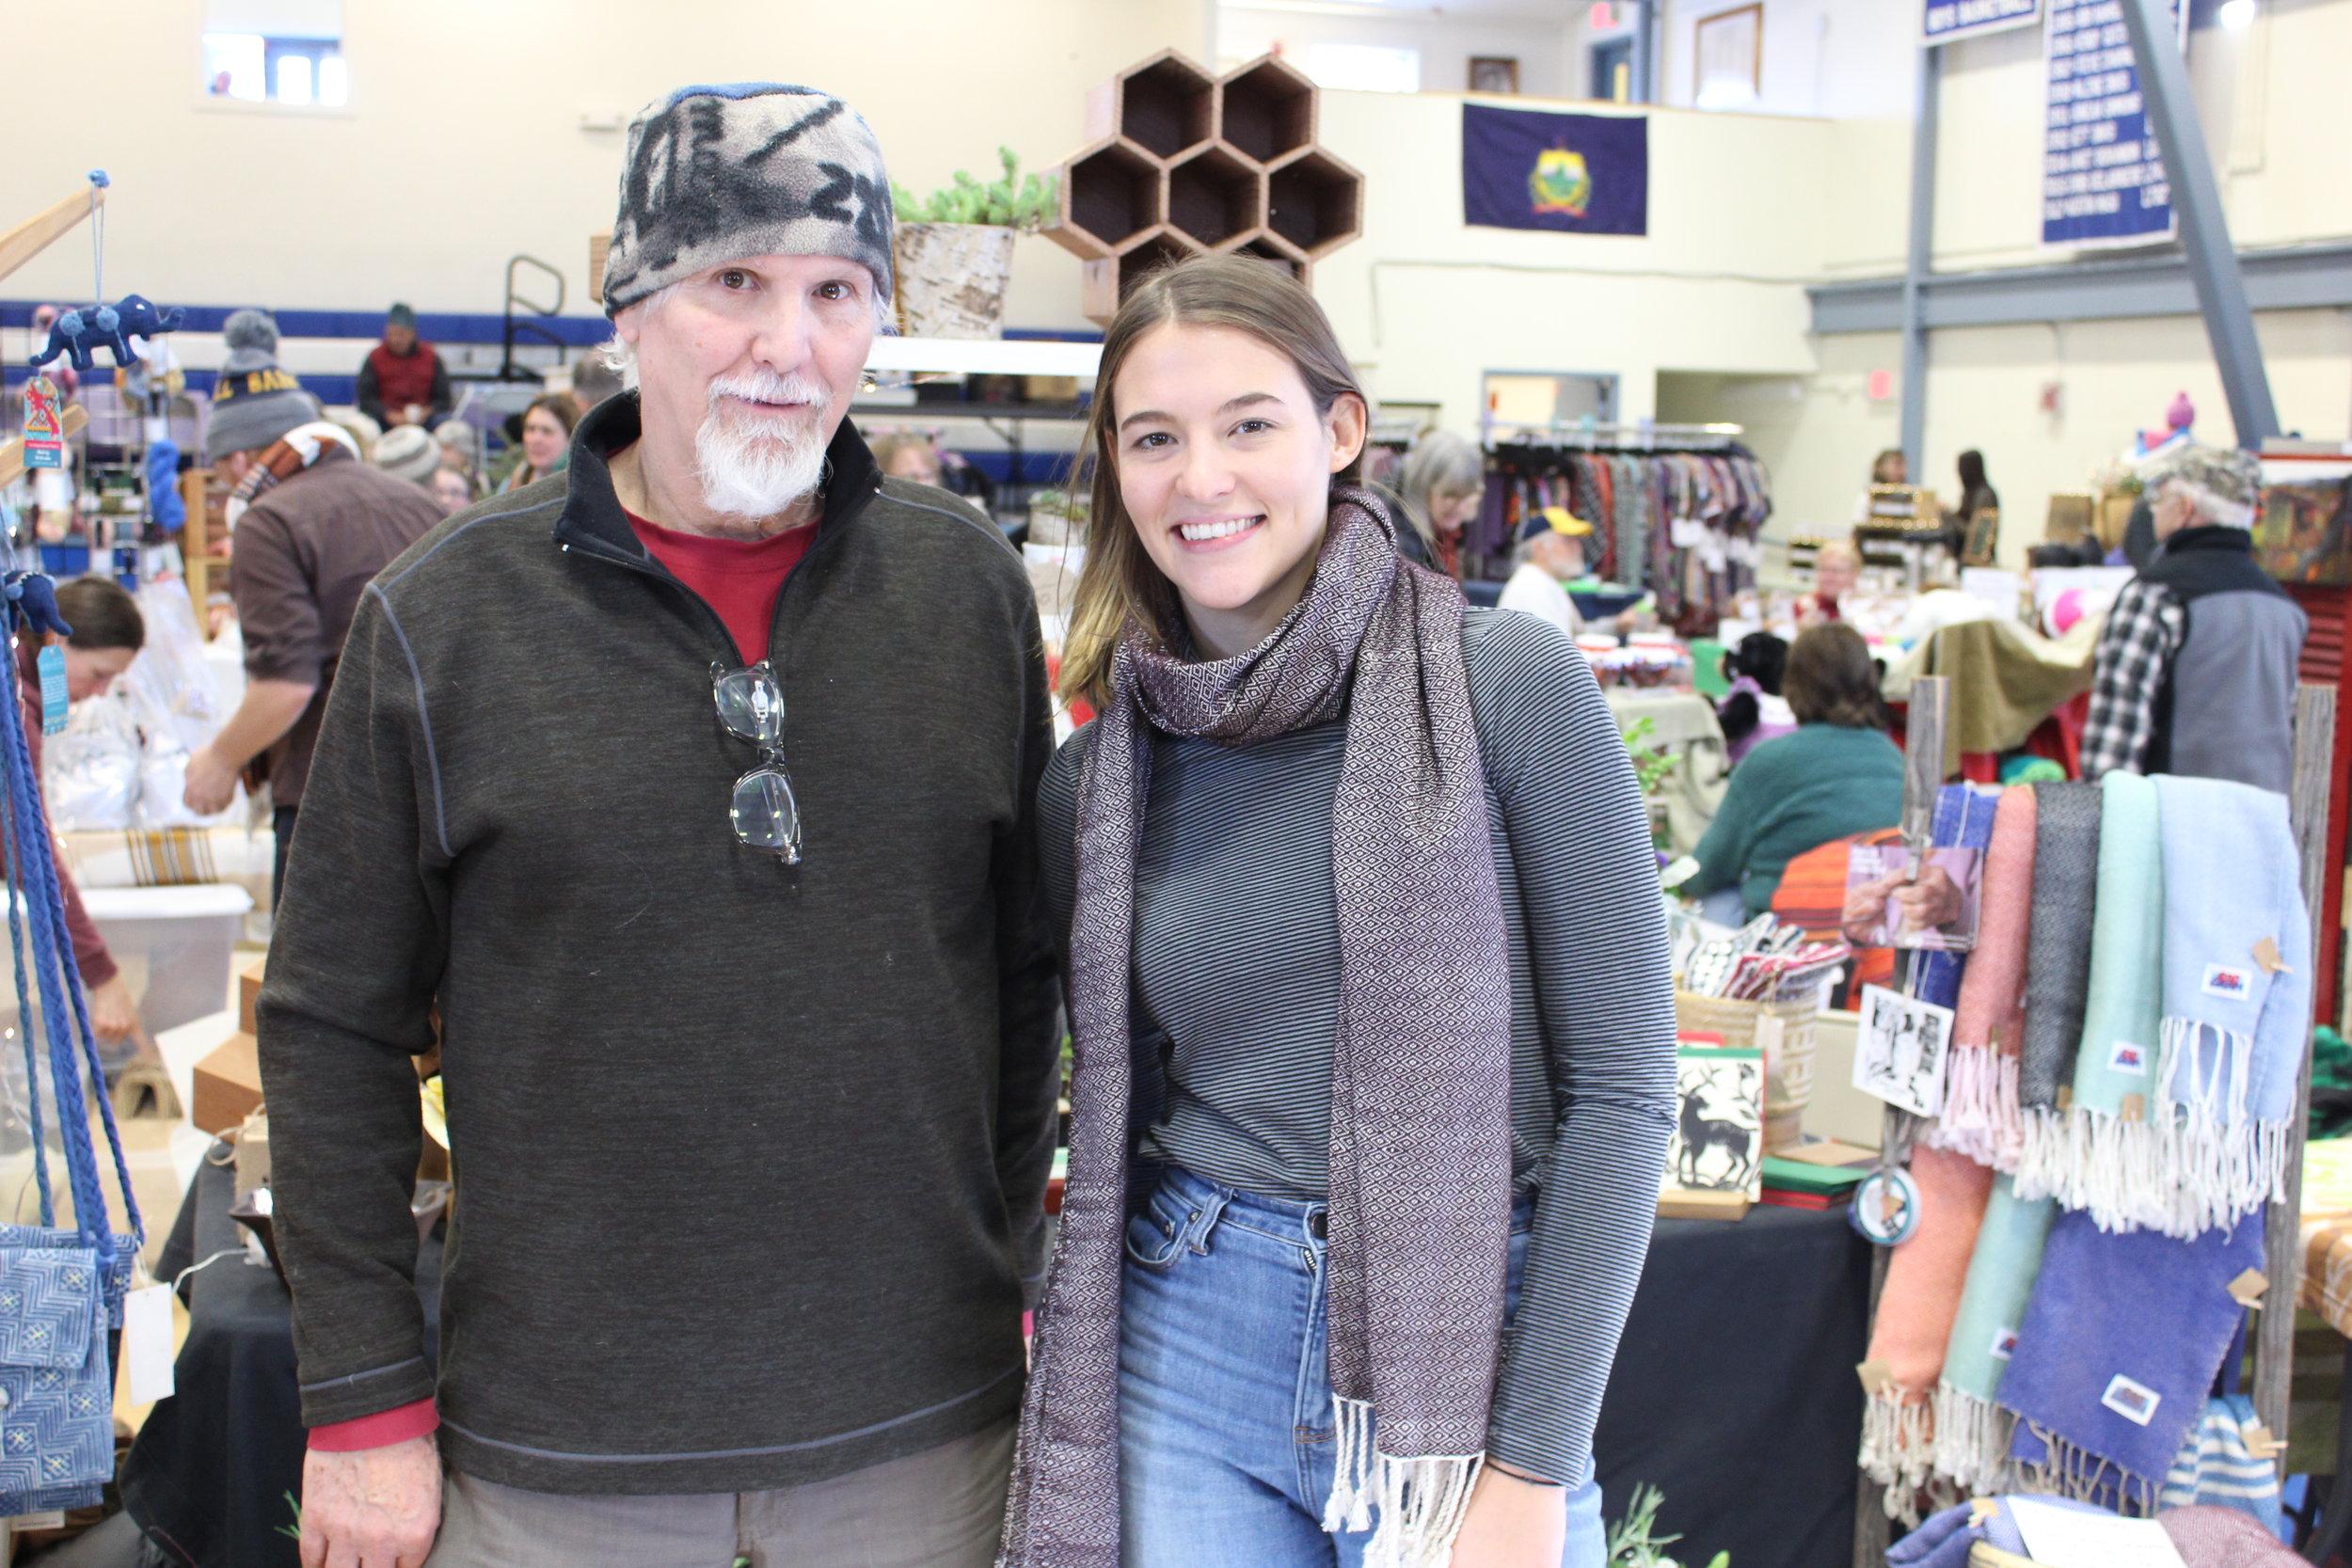 December 7th - Annual WonderArts Holiday Market